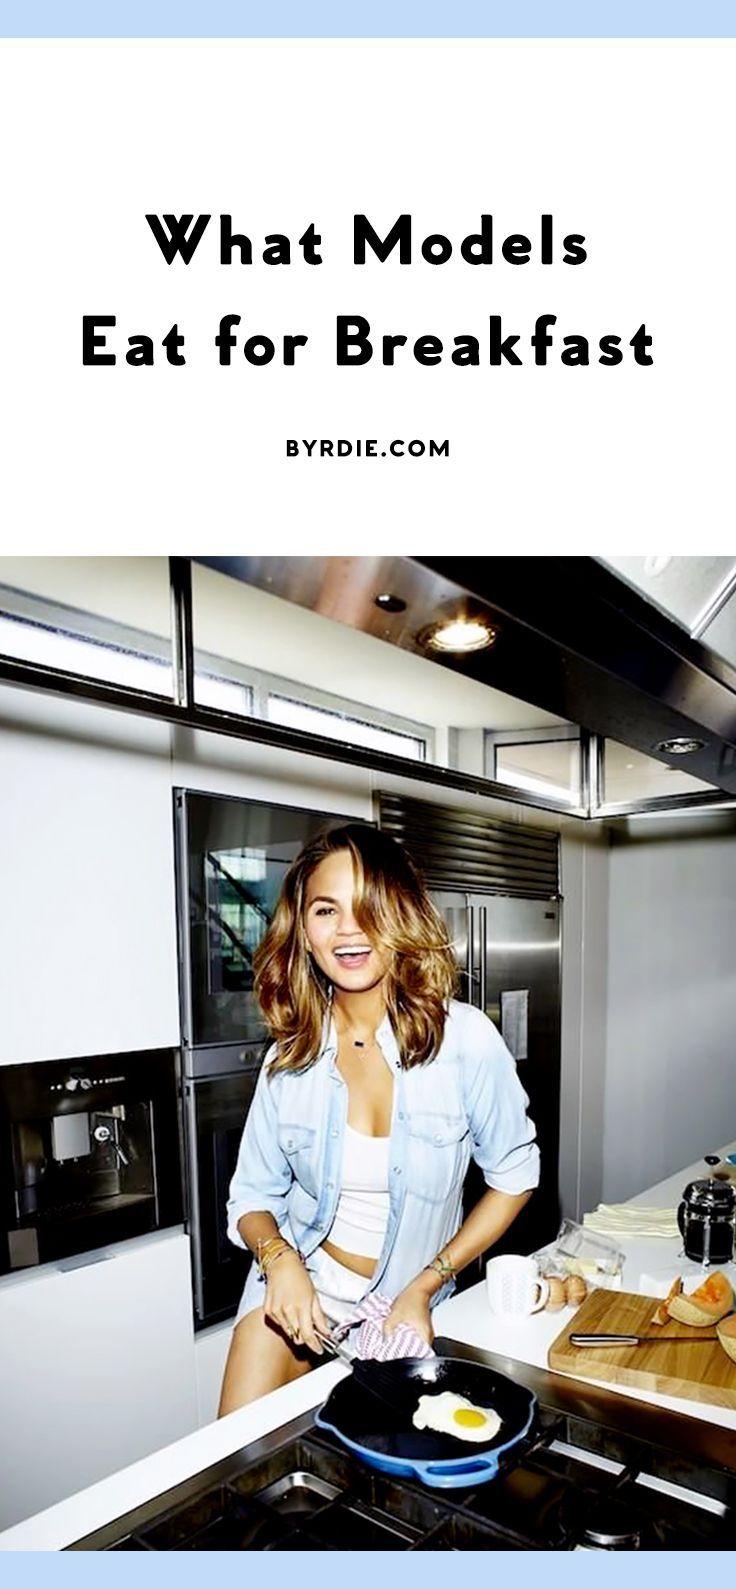 What Models Eat for Breakfast: (http://www.byrdie.com/healthy-breakfast-model-diet)